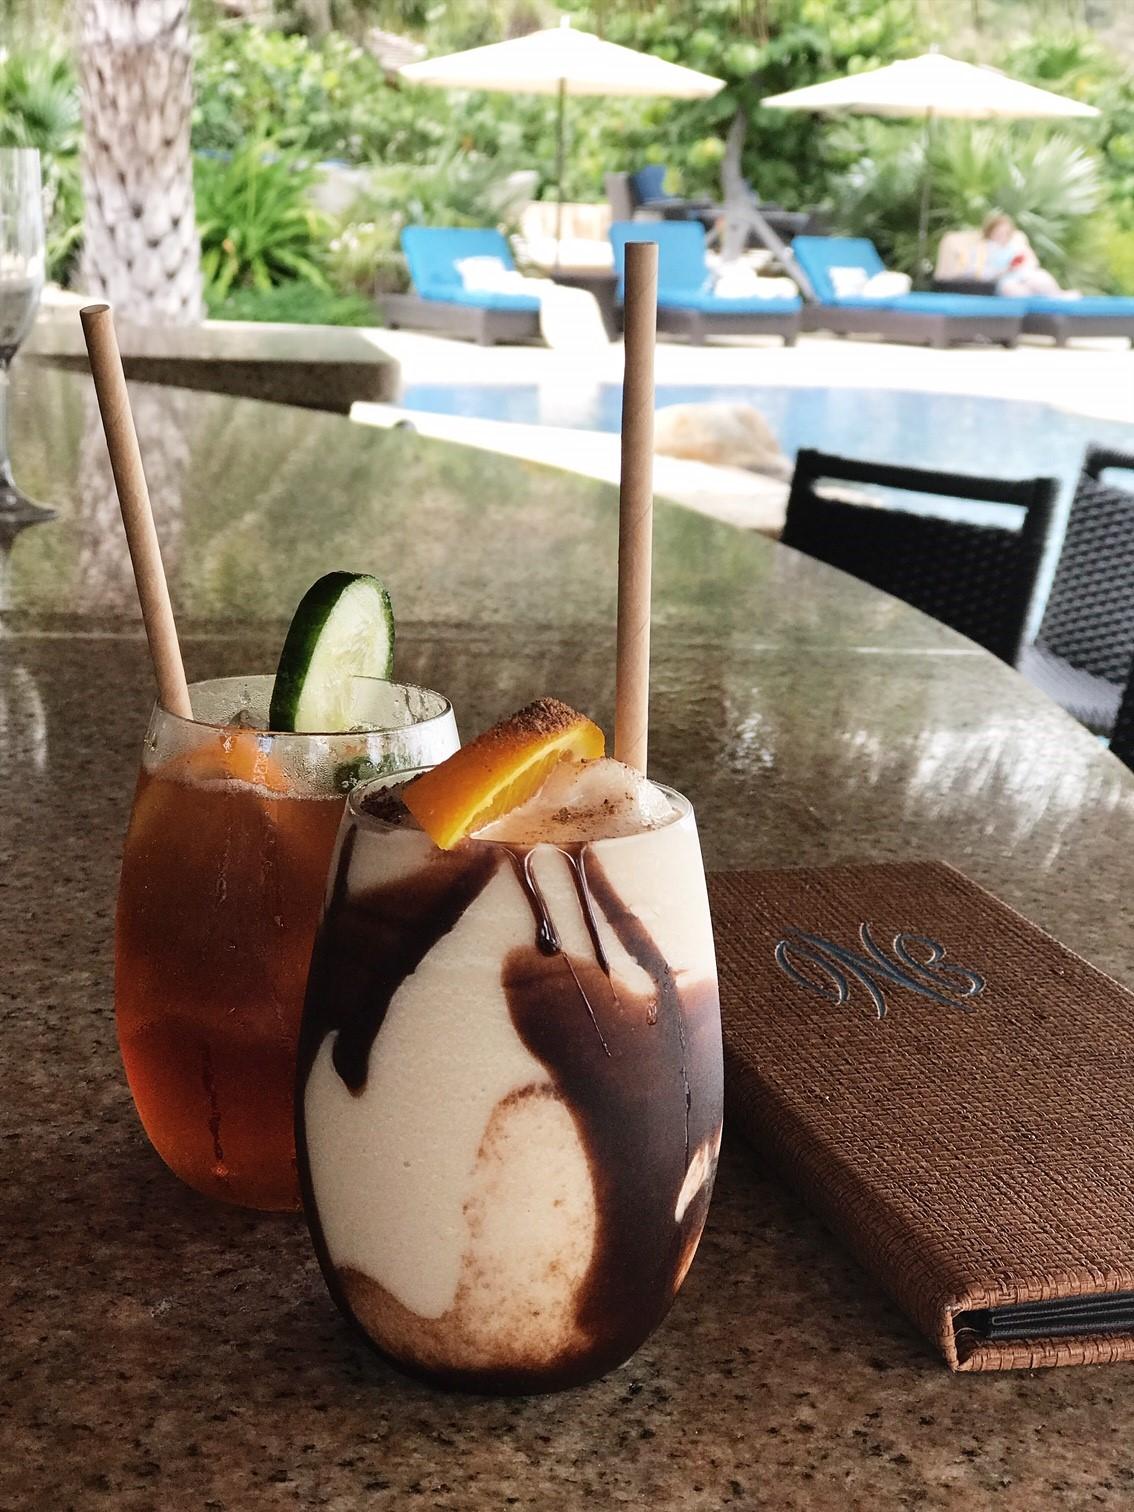 BVI Restaurant Guide - Creamy Bushwhacker cocktail at Oil Nut Bay, Virgin Gorda